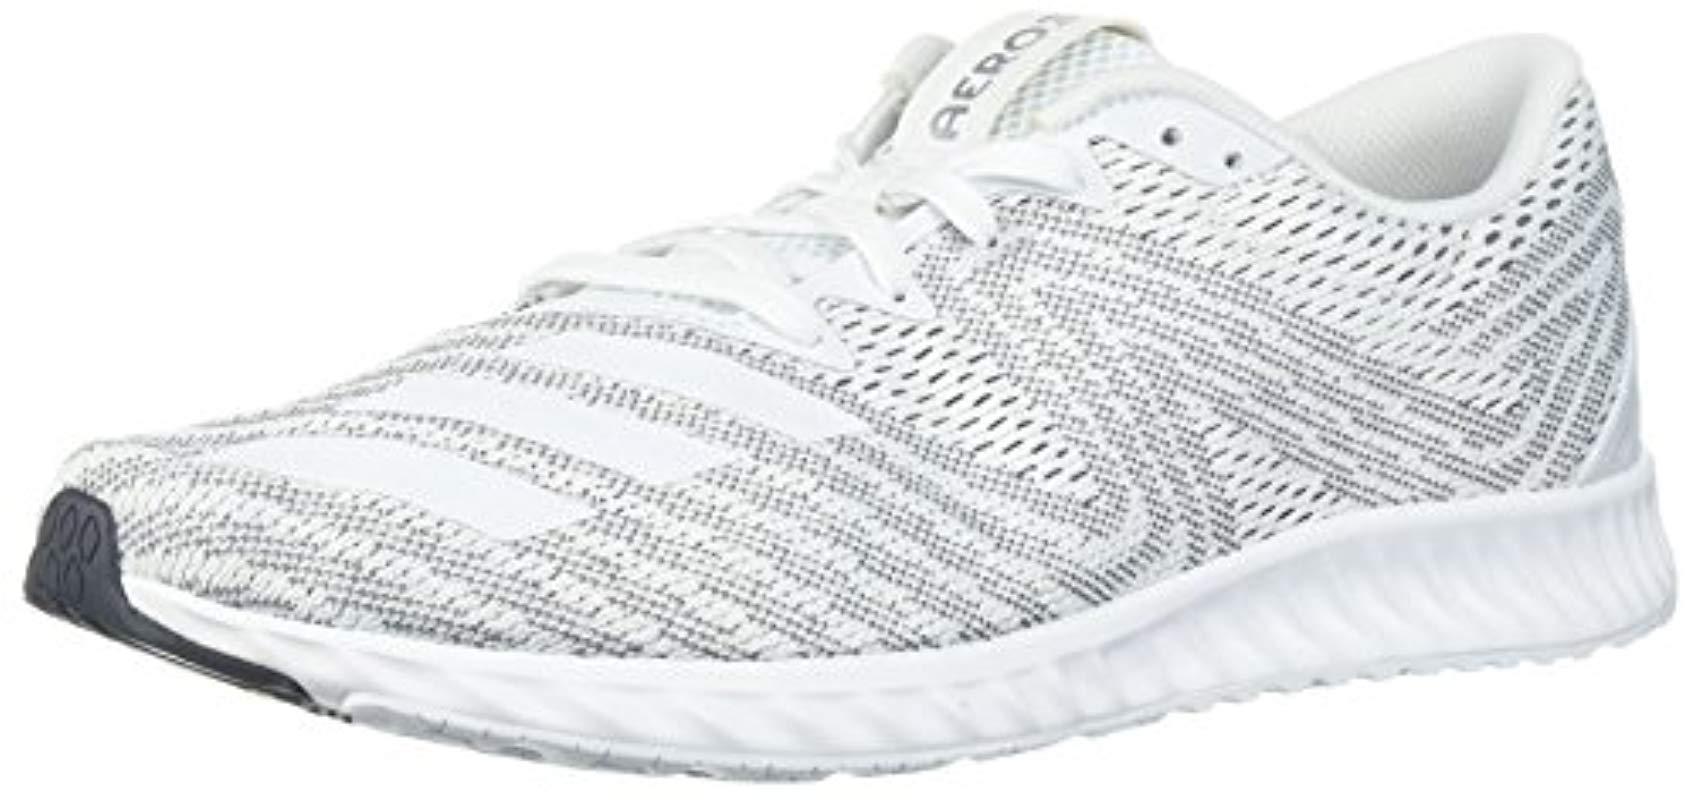 9f18b7d454329 Lyst - adidas Aerobounce Pr W Running Shoe in White - Save 20%